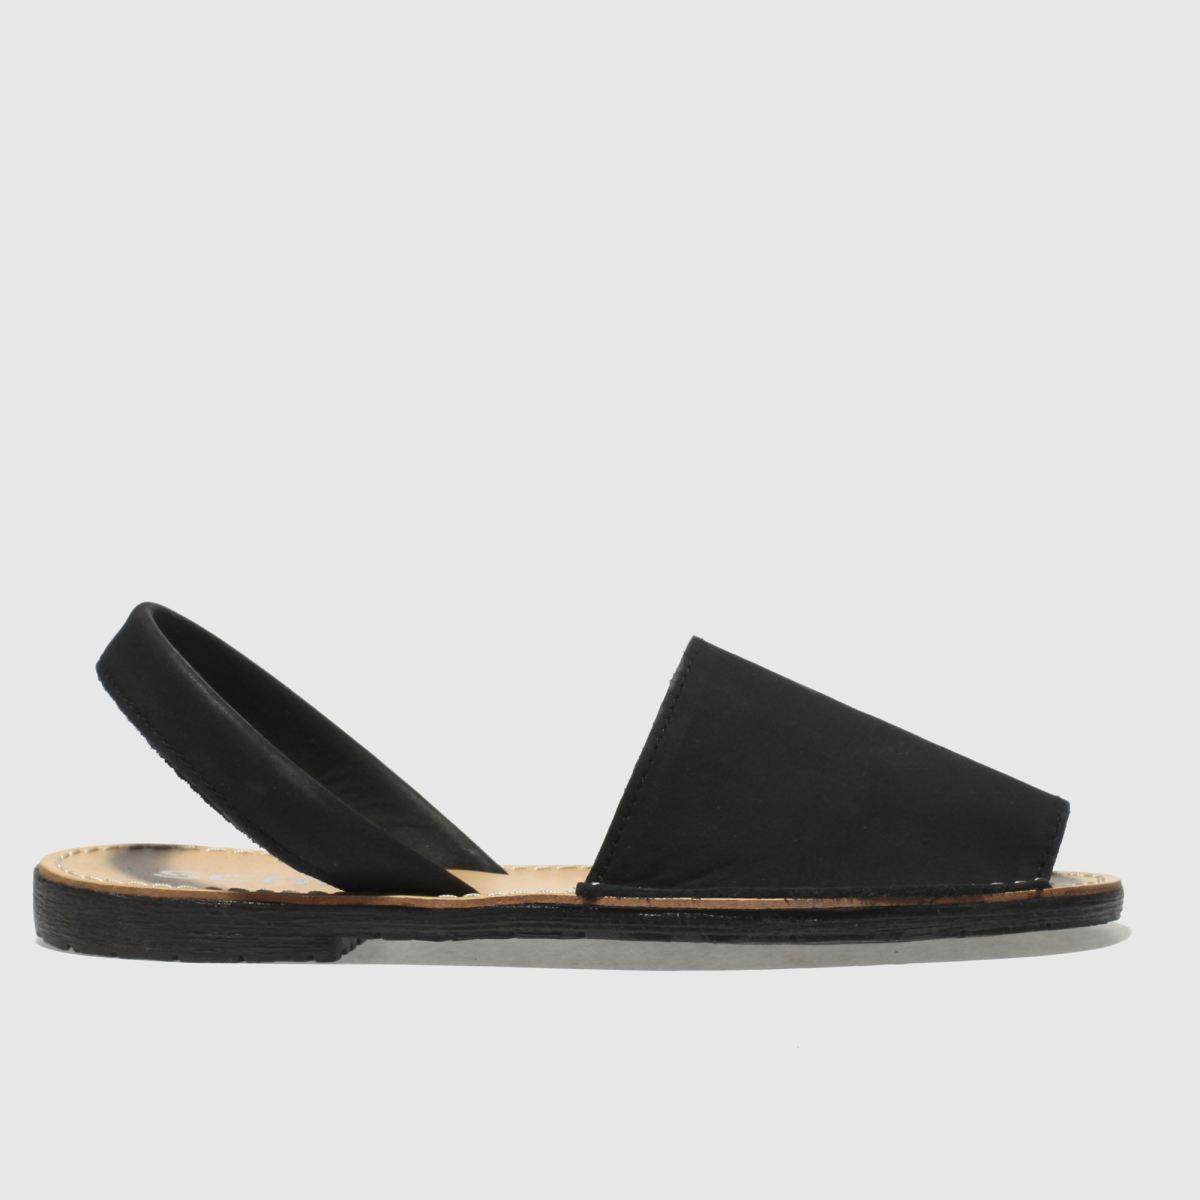 schuh black barcelona sandals